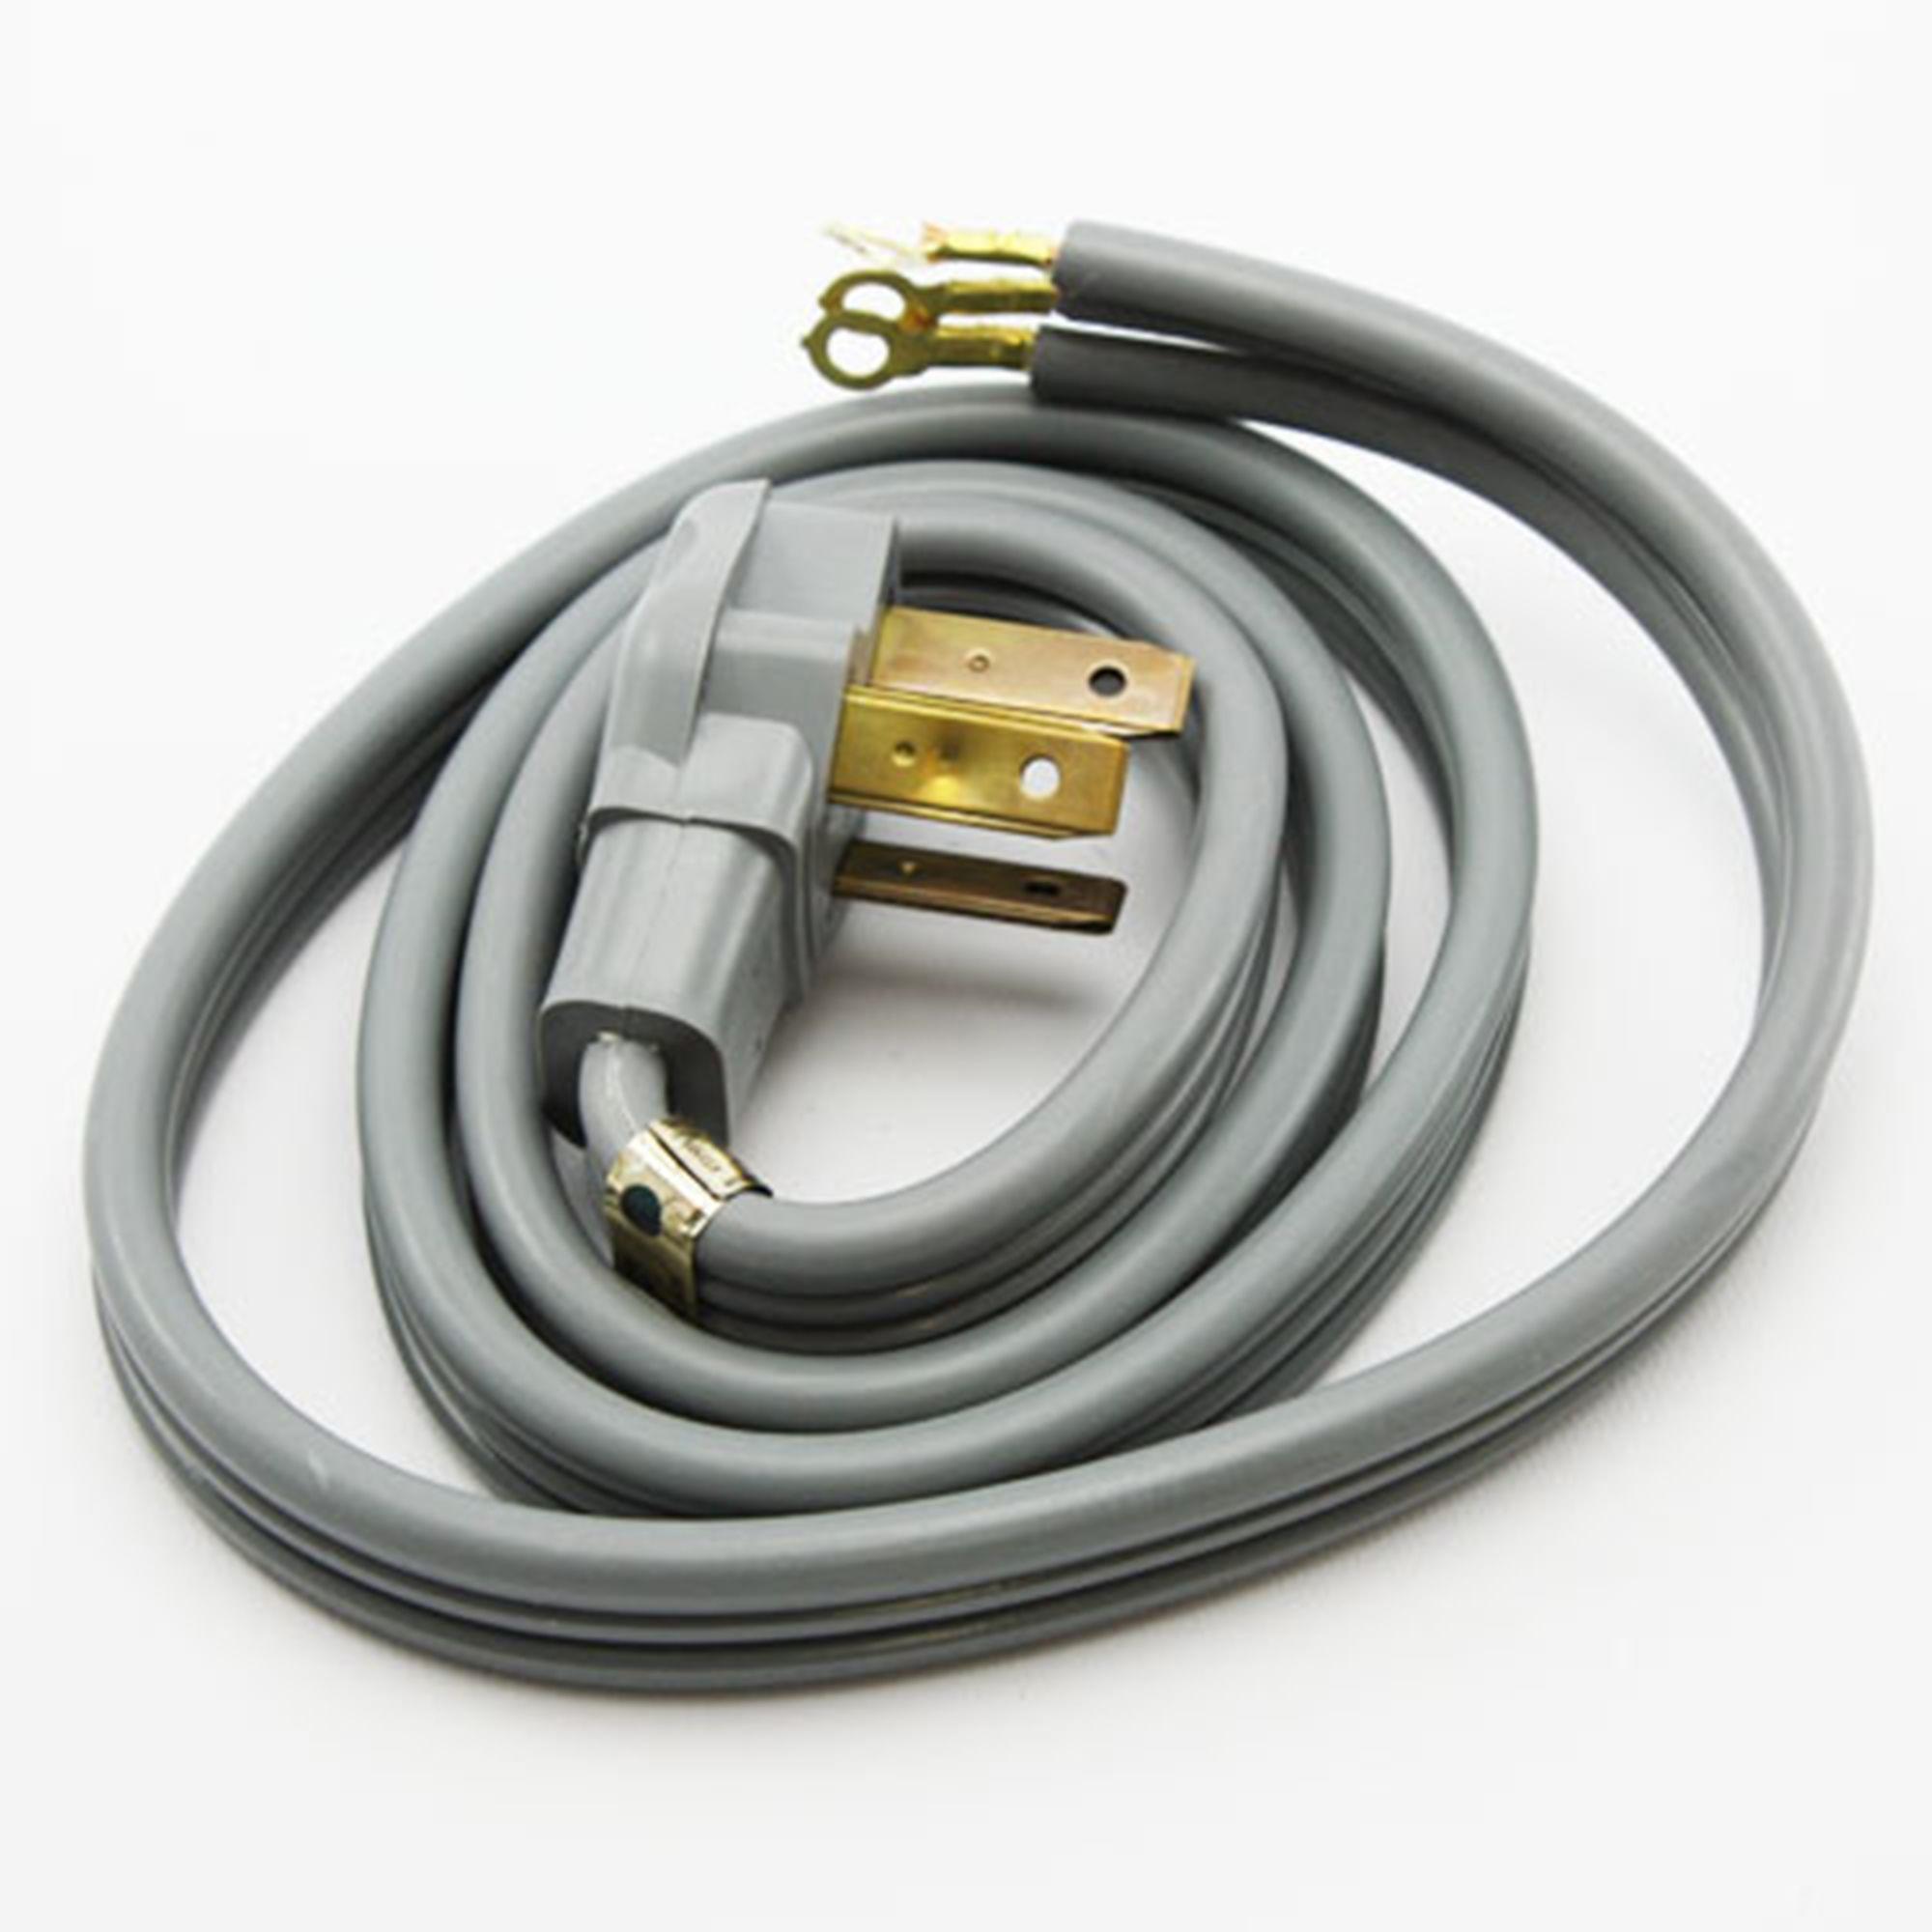 range stove oven power cord 3 wire 5 39 long 40a 220v. Black Bedroom Furniture Sets. Home Design Ideas